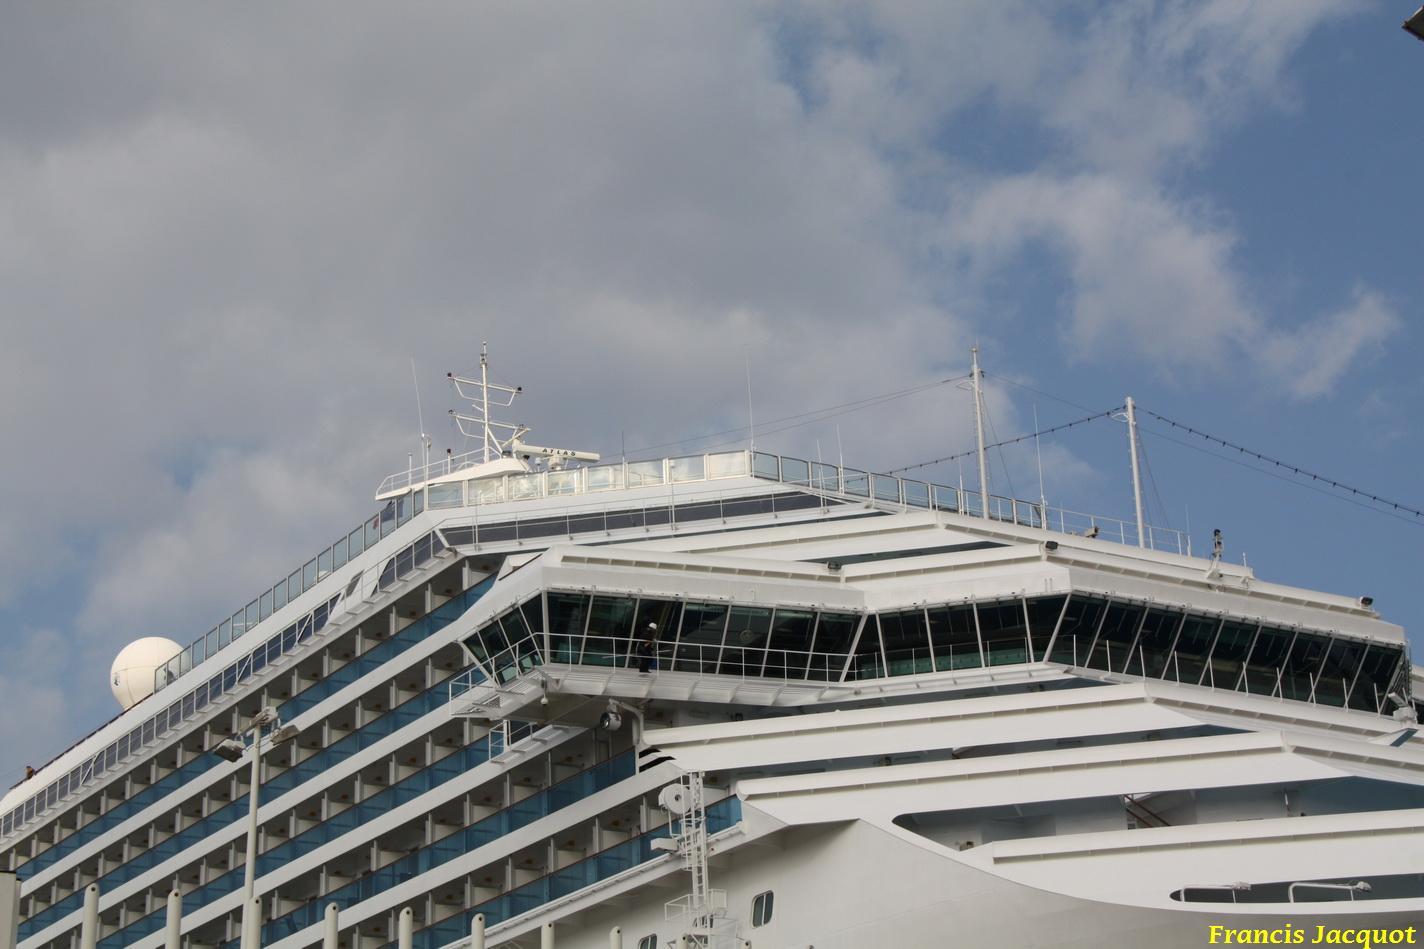 Le Costa Magica en escale à La Seyne sur Mer 0711